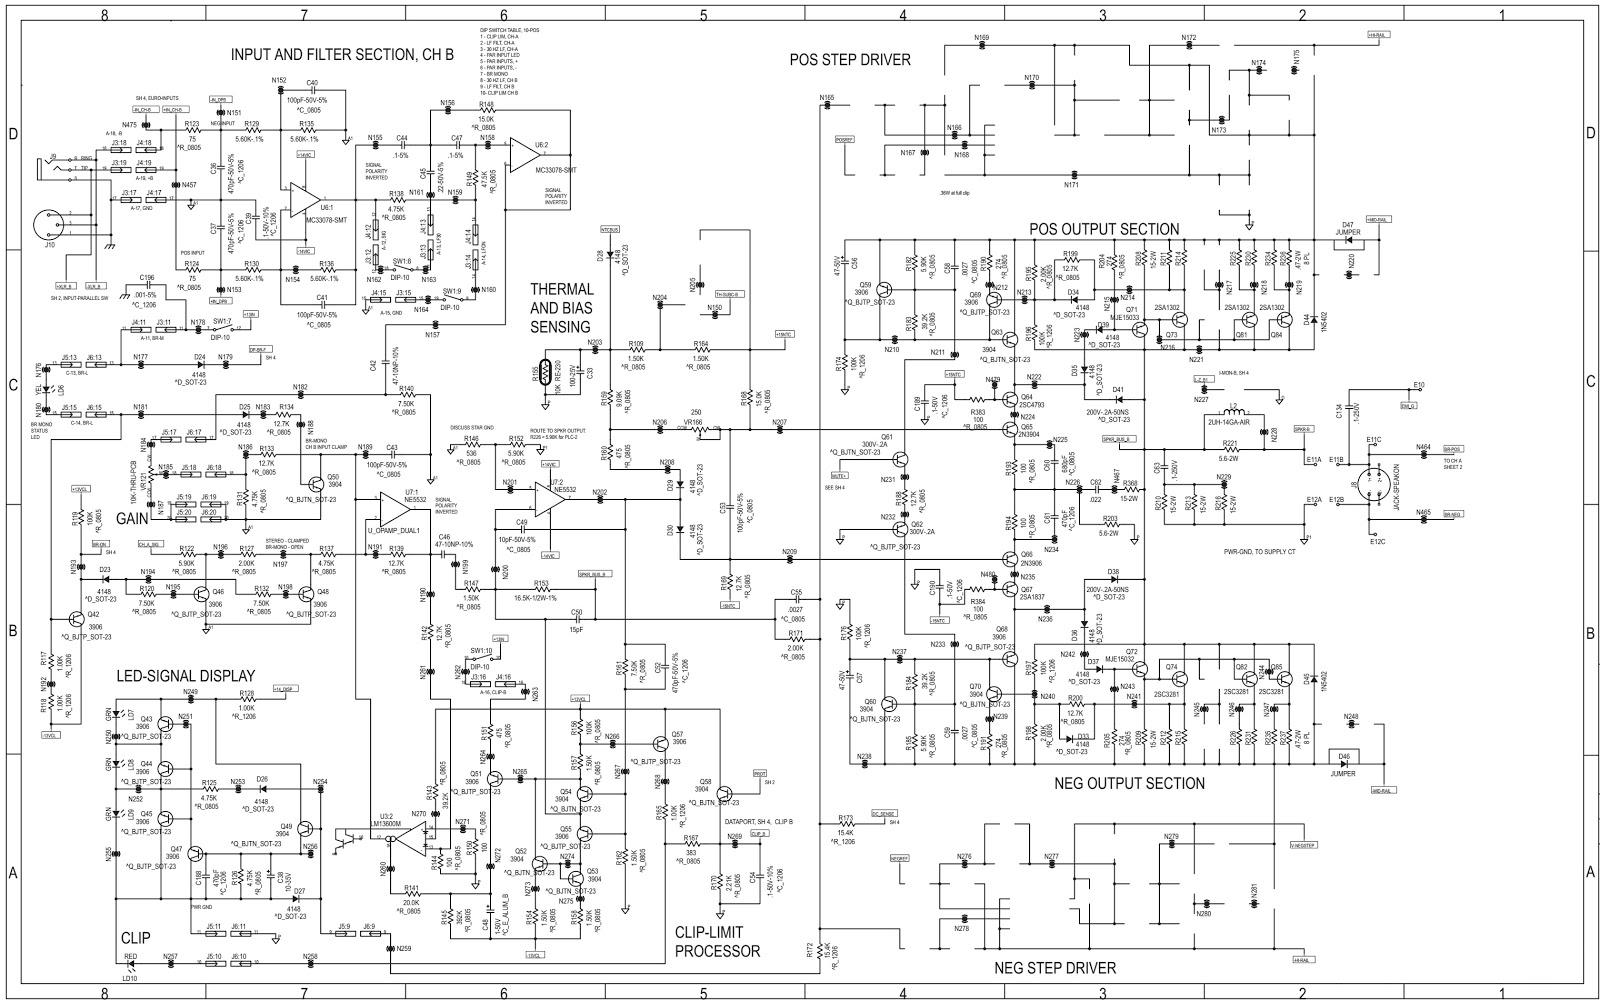 Qsc Plx 1202 Test Procedure And Circuit Diagram Electro Help Myvariacwiringdiagram3jpg Schematic